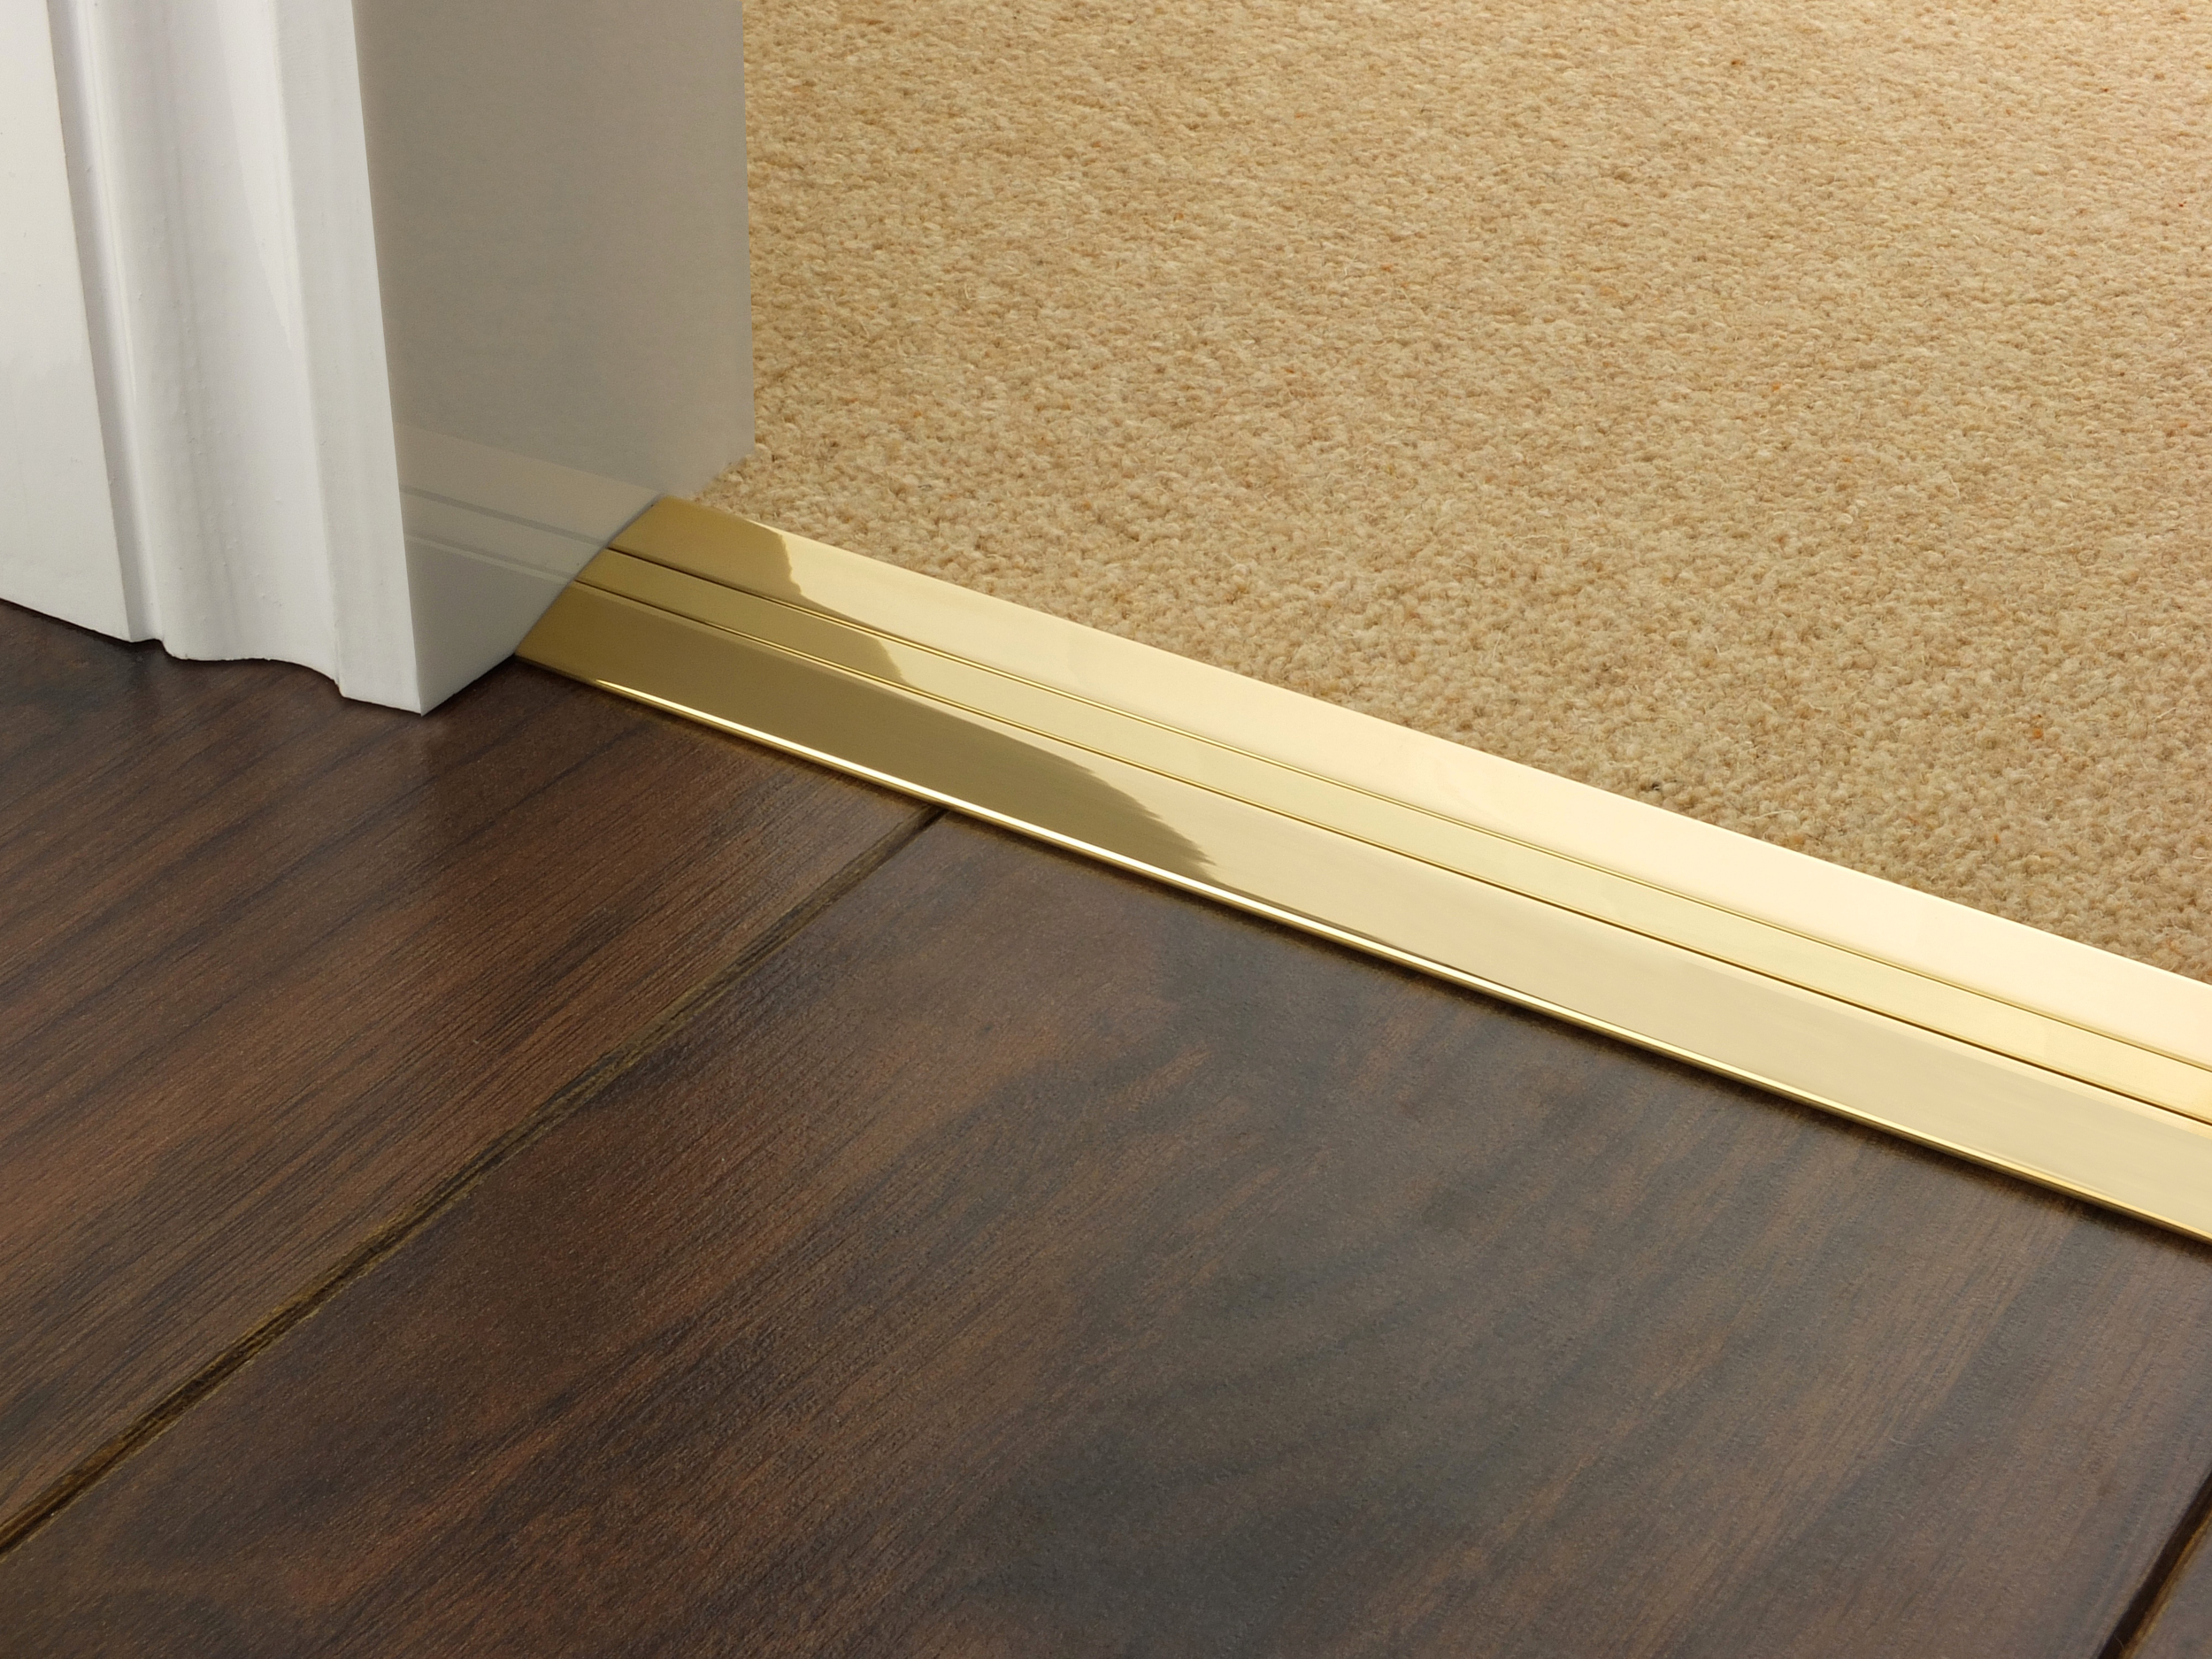 door_bar_brass_posh_38_laminate_carpet.jpg